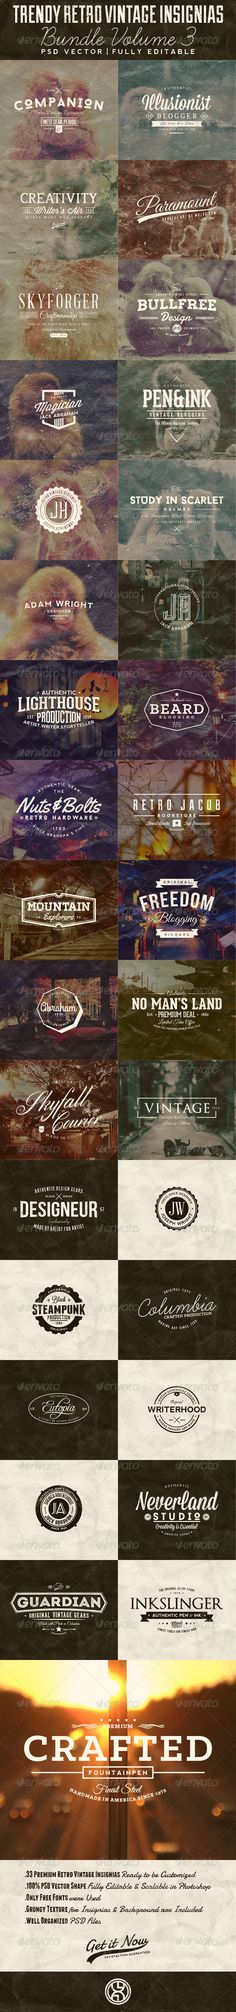 33 Trendy Retro Vintage Insignias Bundle Volume 3 - Badges & Stickers Web Elements